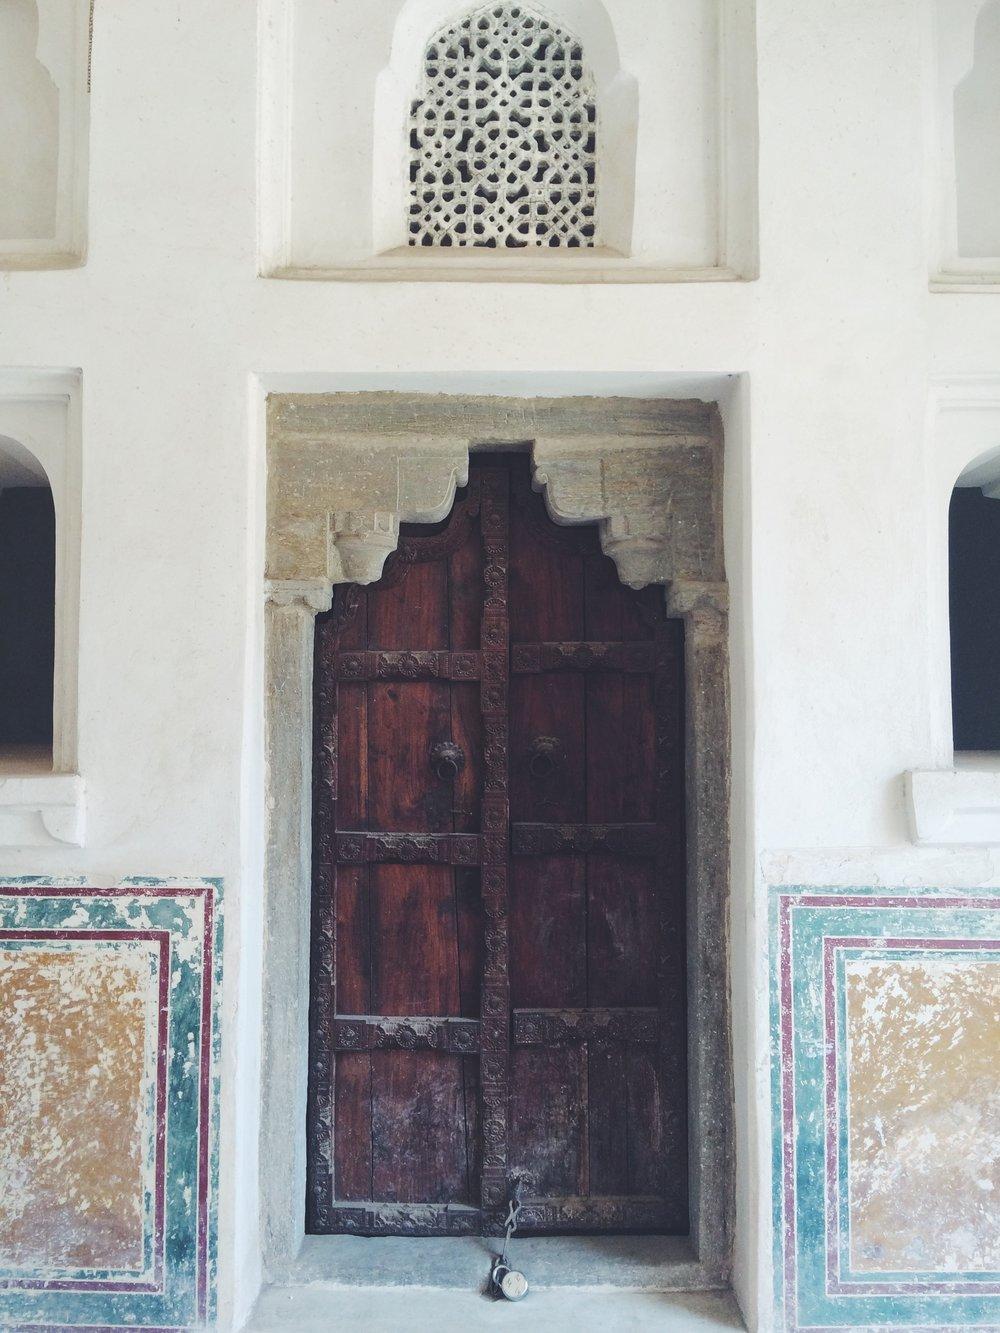 Amer Fort, Jaipur, Rajasthan, India.